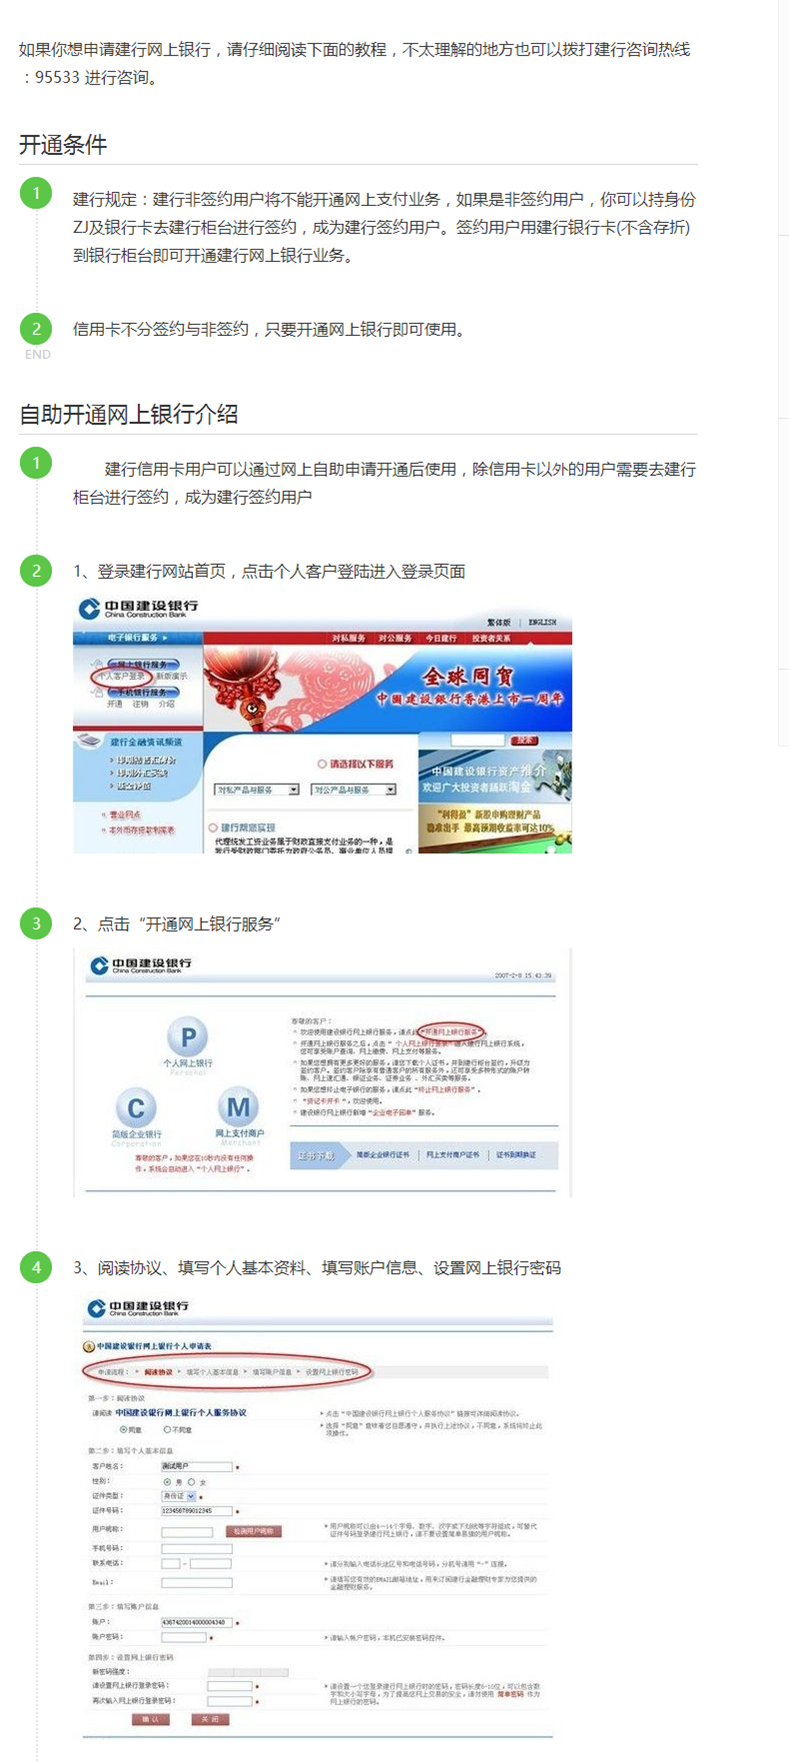 http://dyy.enwei.com/data/upload/shop/article/05429734775269980.png